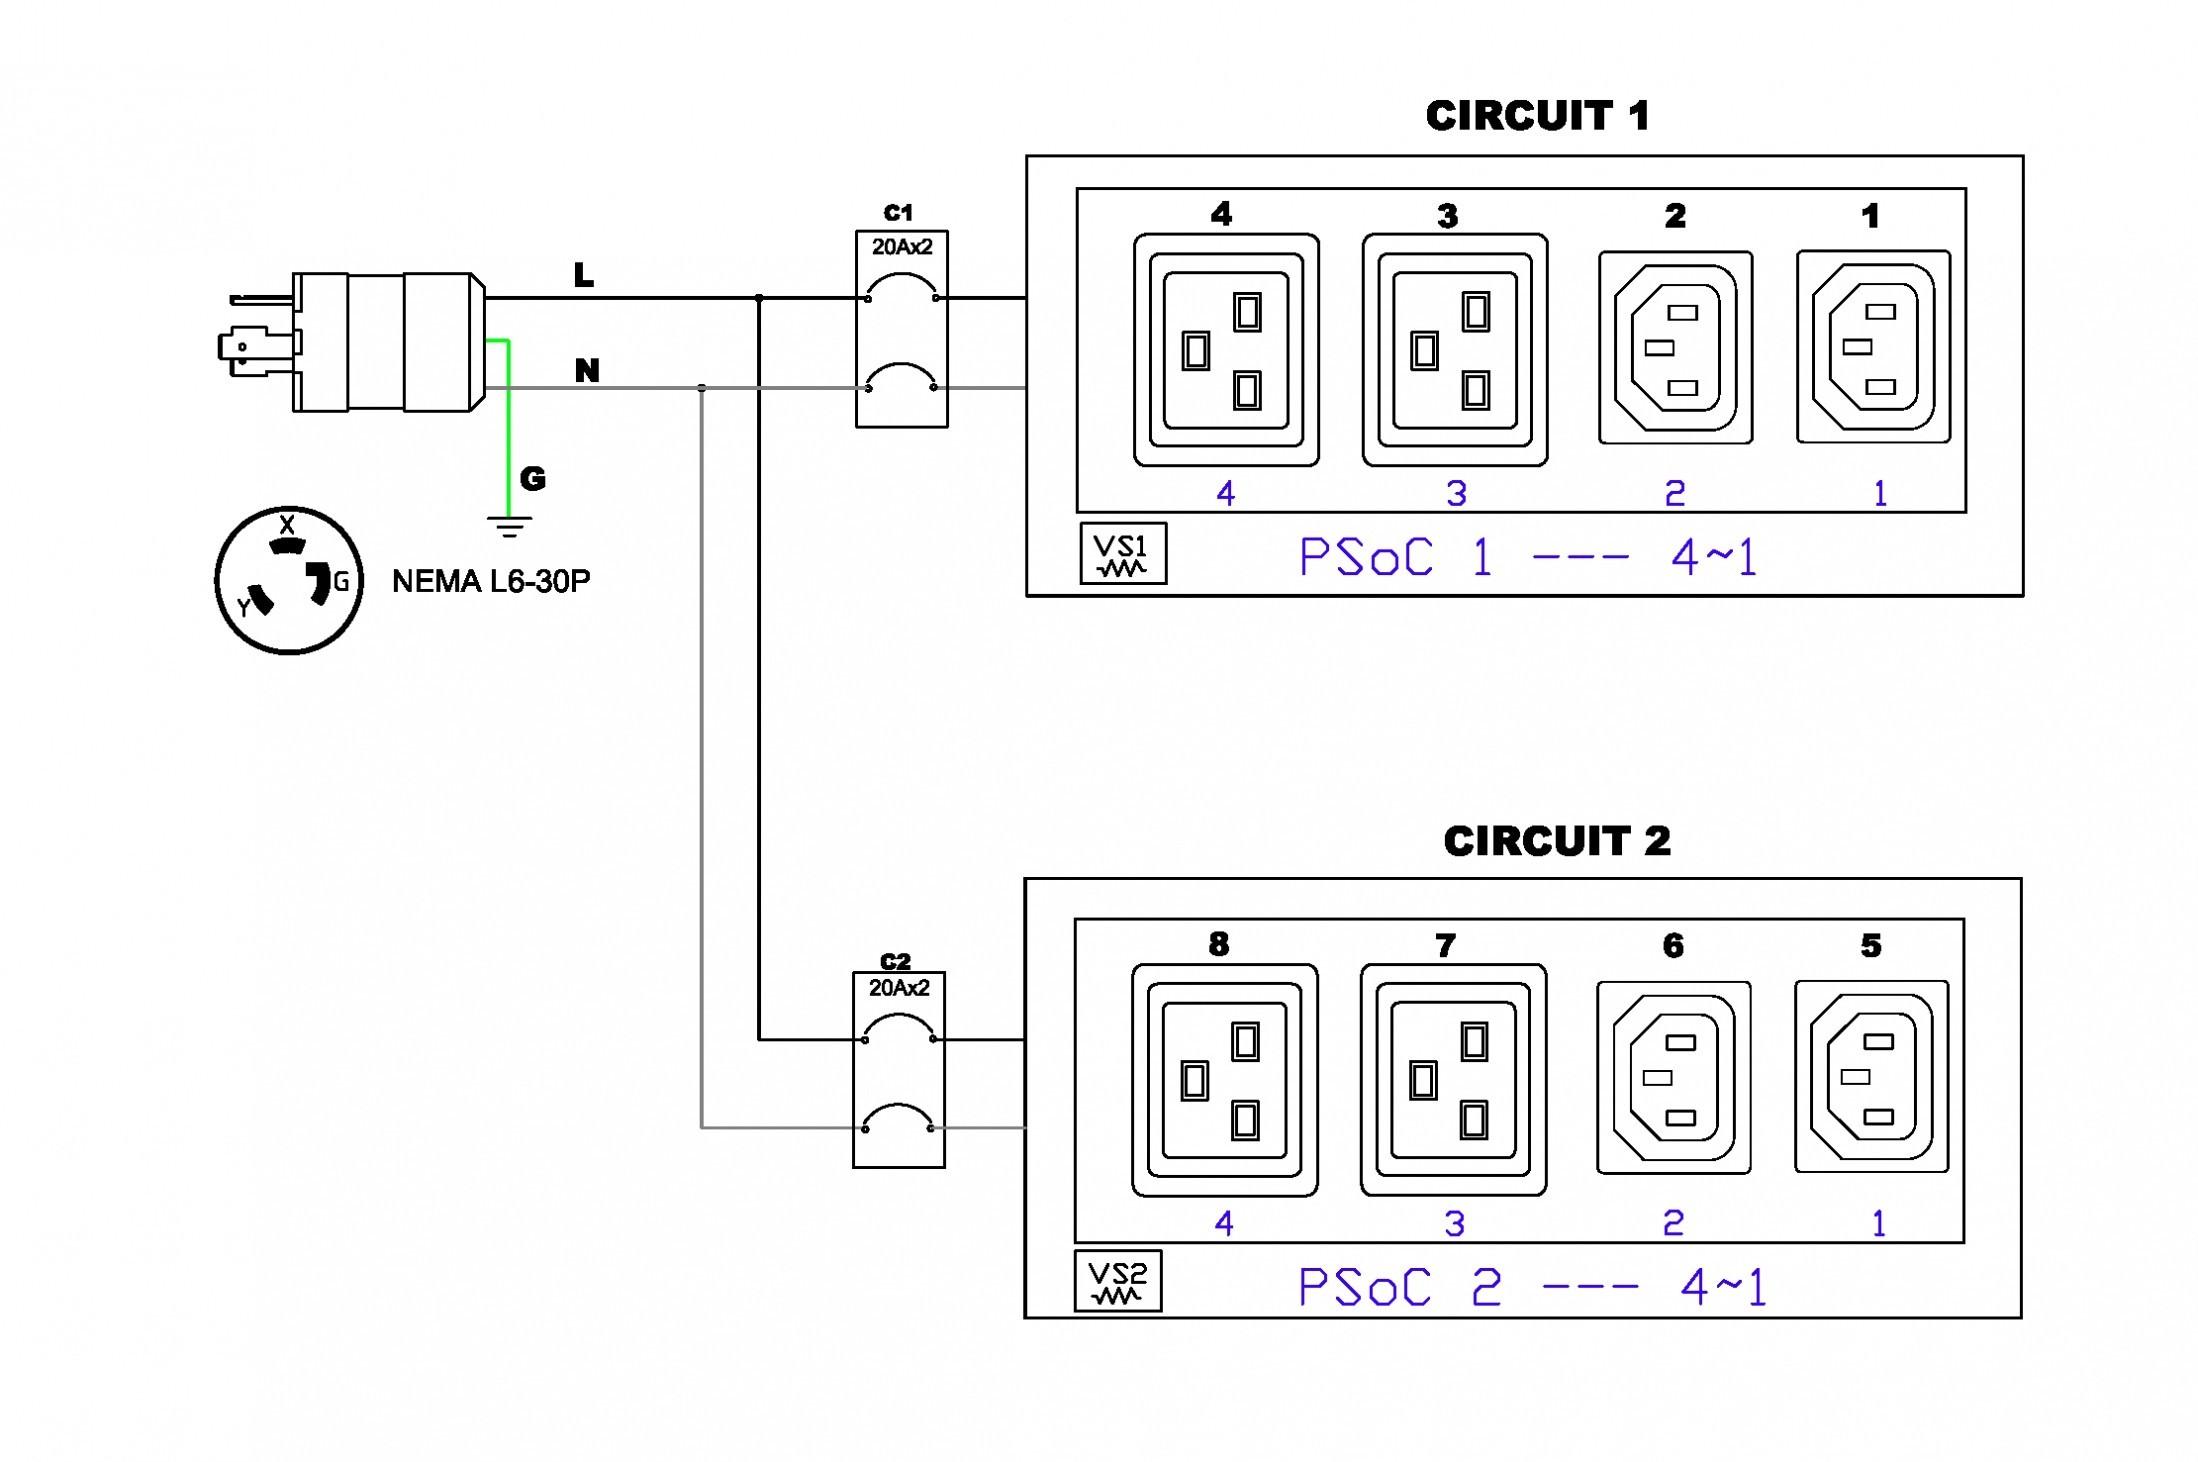 L14 30p Wiring Diagram L14 30 Wiring Diagram Awesome Nema L5 1 with L6 Of L14 30p Wiring Diagram Nema Wiring Diagram Wire Data Schema •